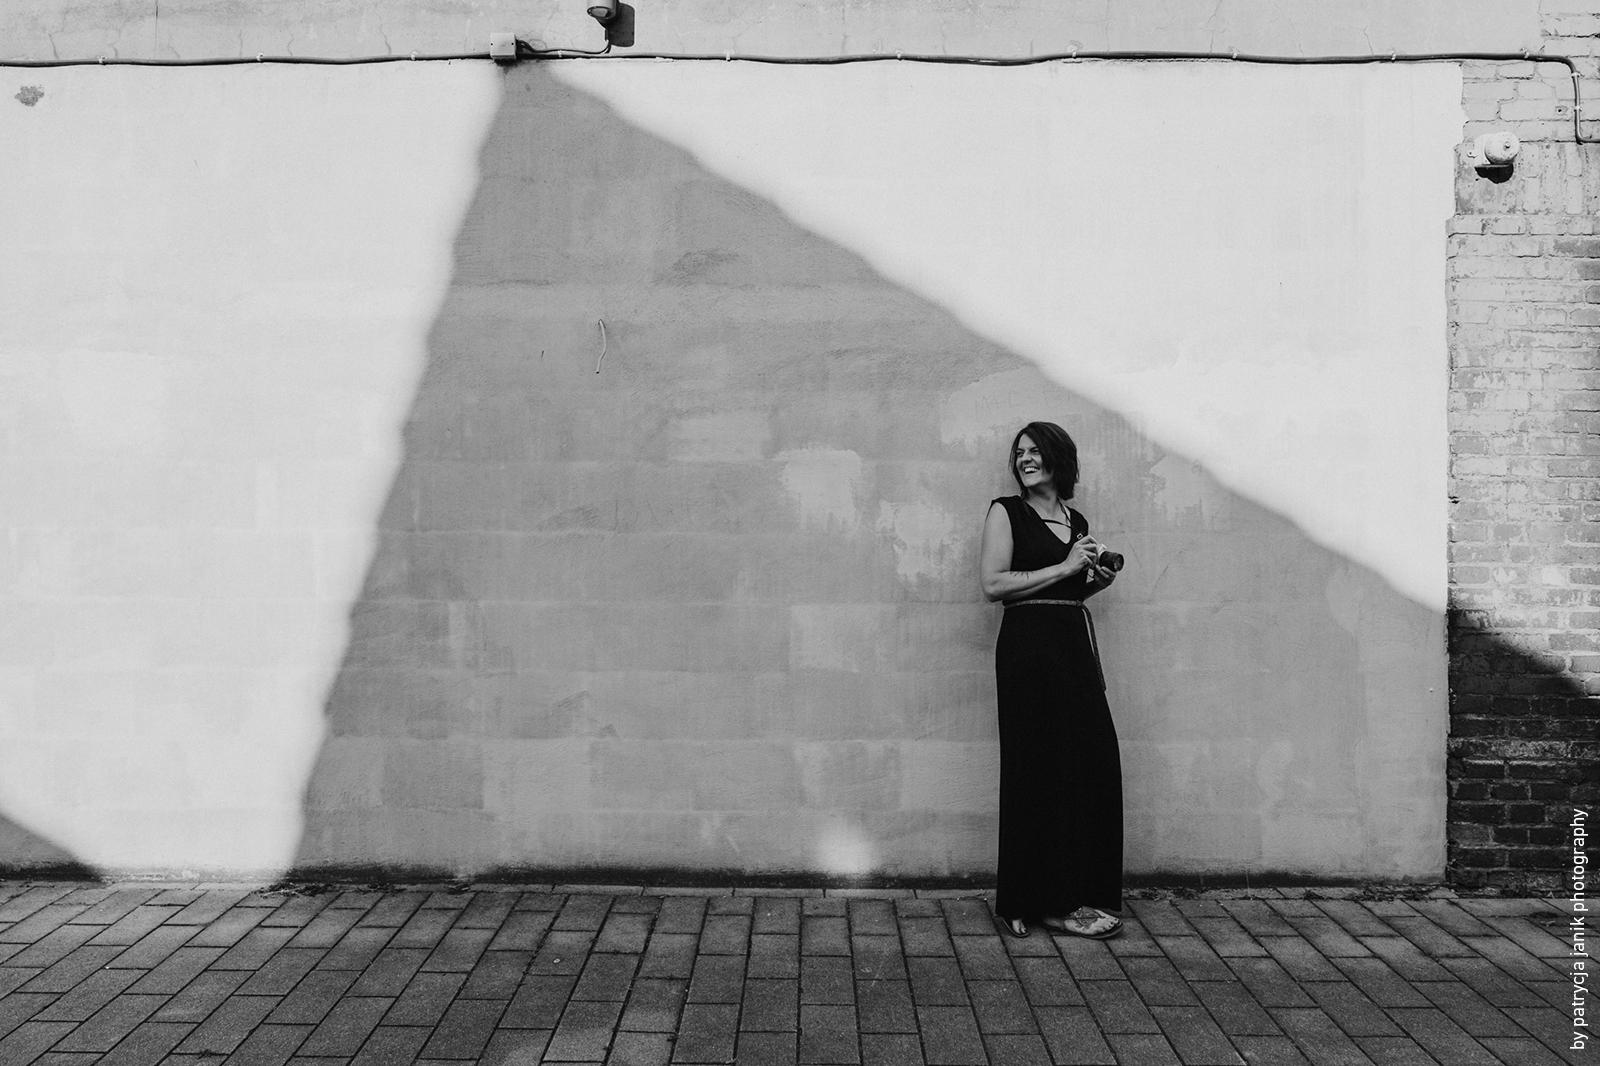 Frau im Maxikleid vor Betonwand Zeche Ewald